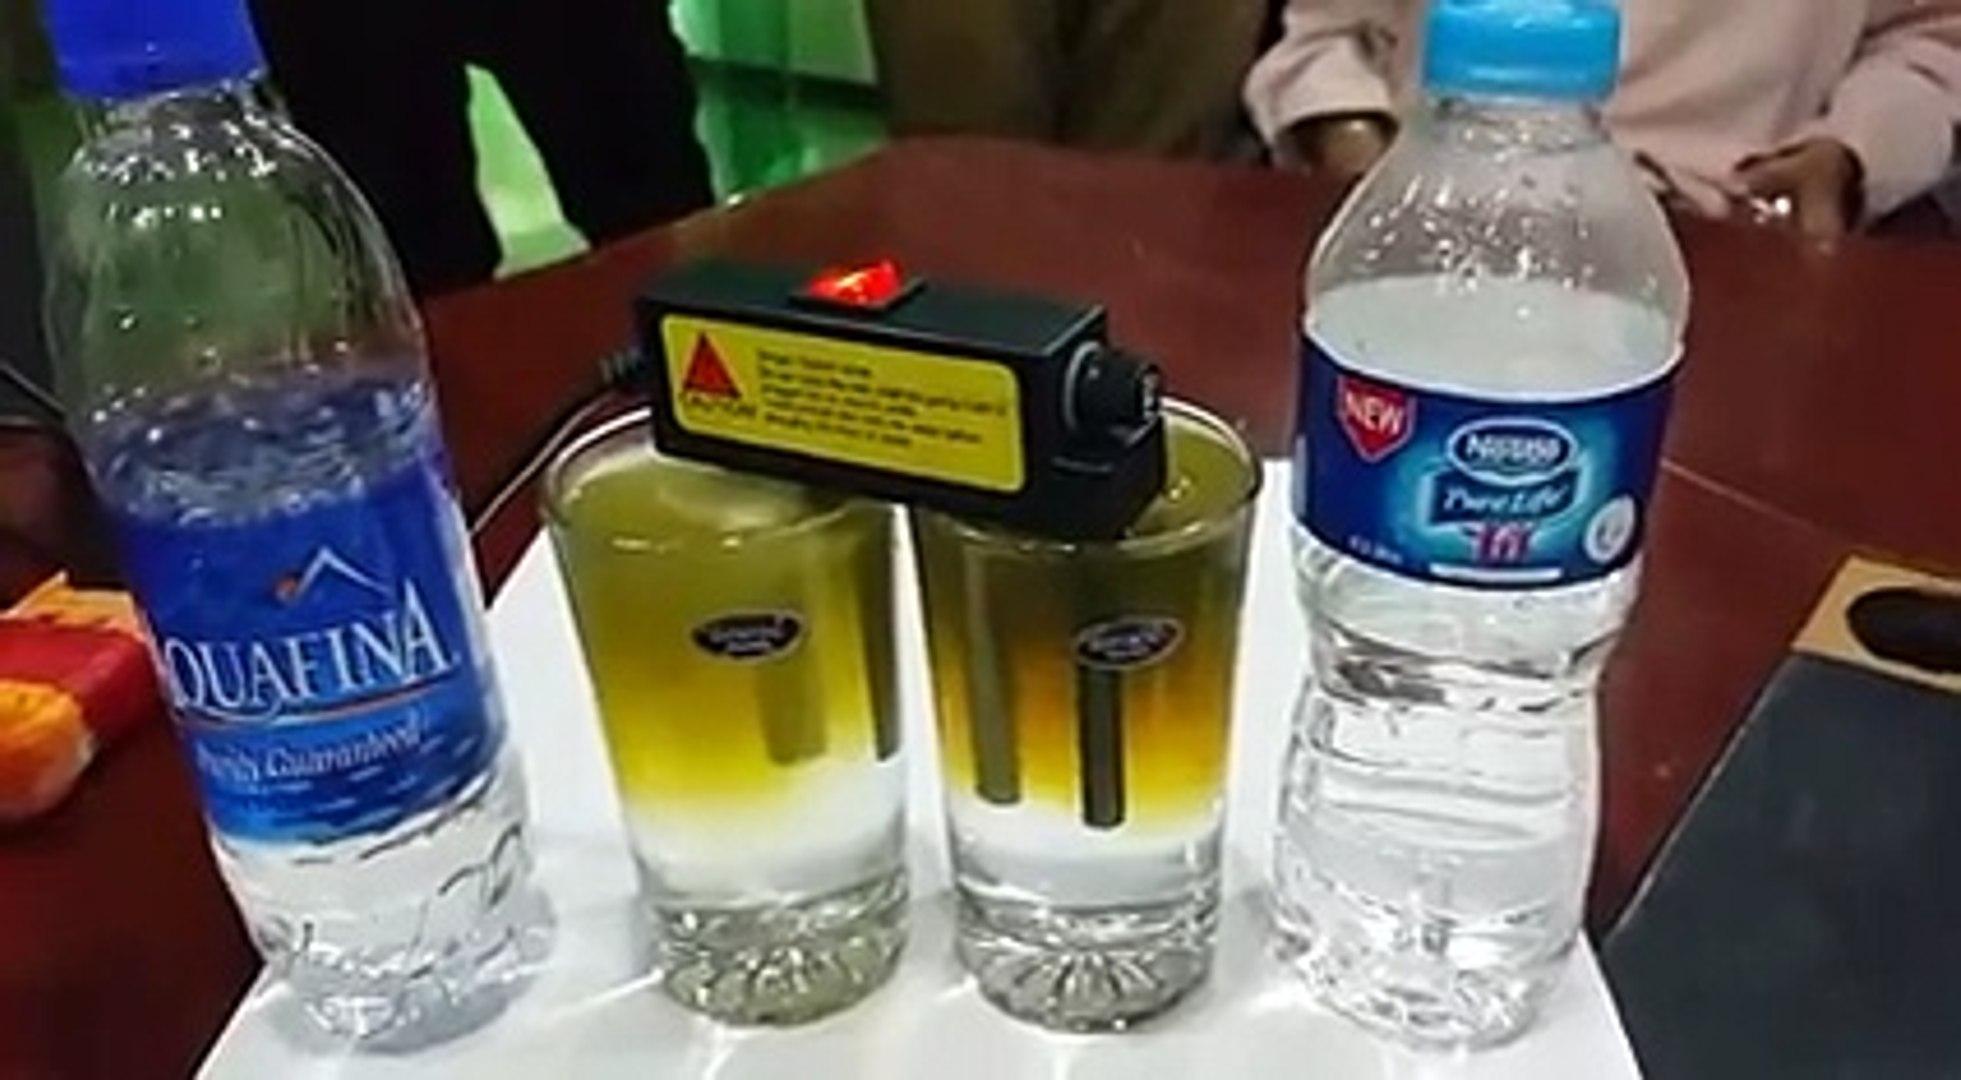 Pakistani Mineral Water, Aquafina & Nestle Controversy Exposed